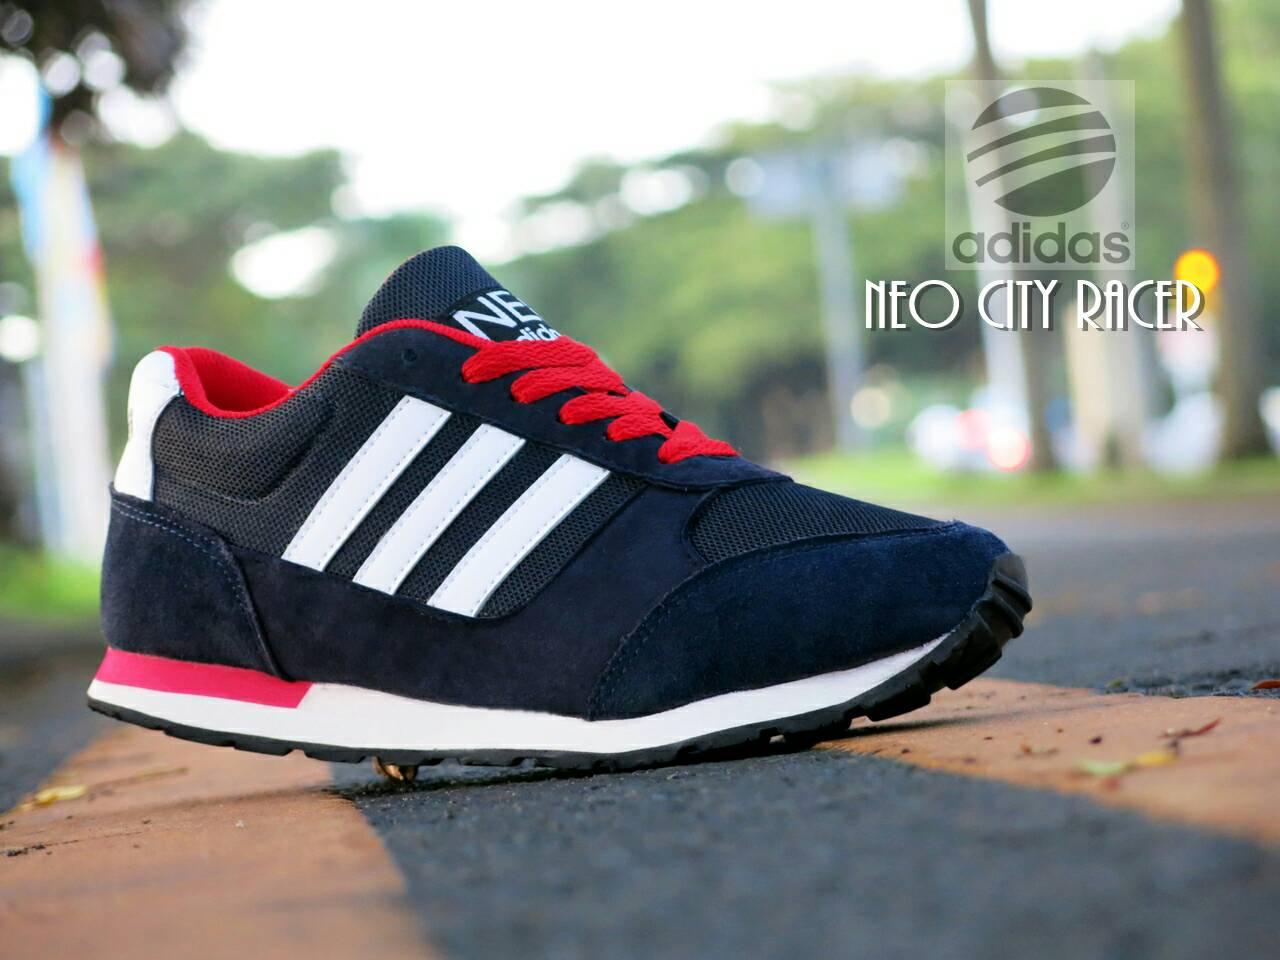 Coupon For Harga Adidas Neo City Racer Black 8085b 5c304 Hitam